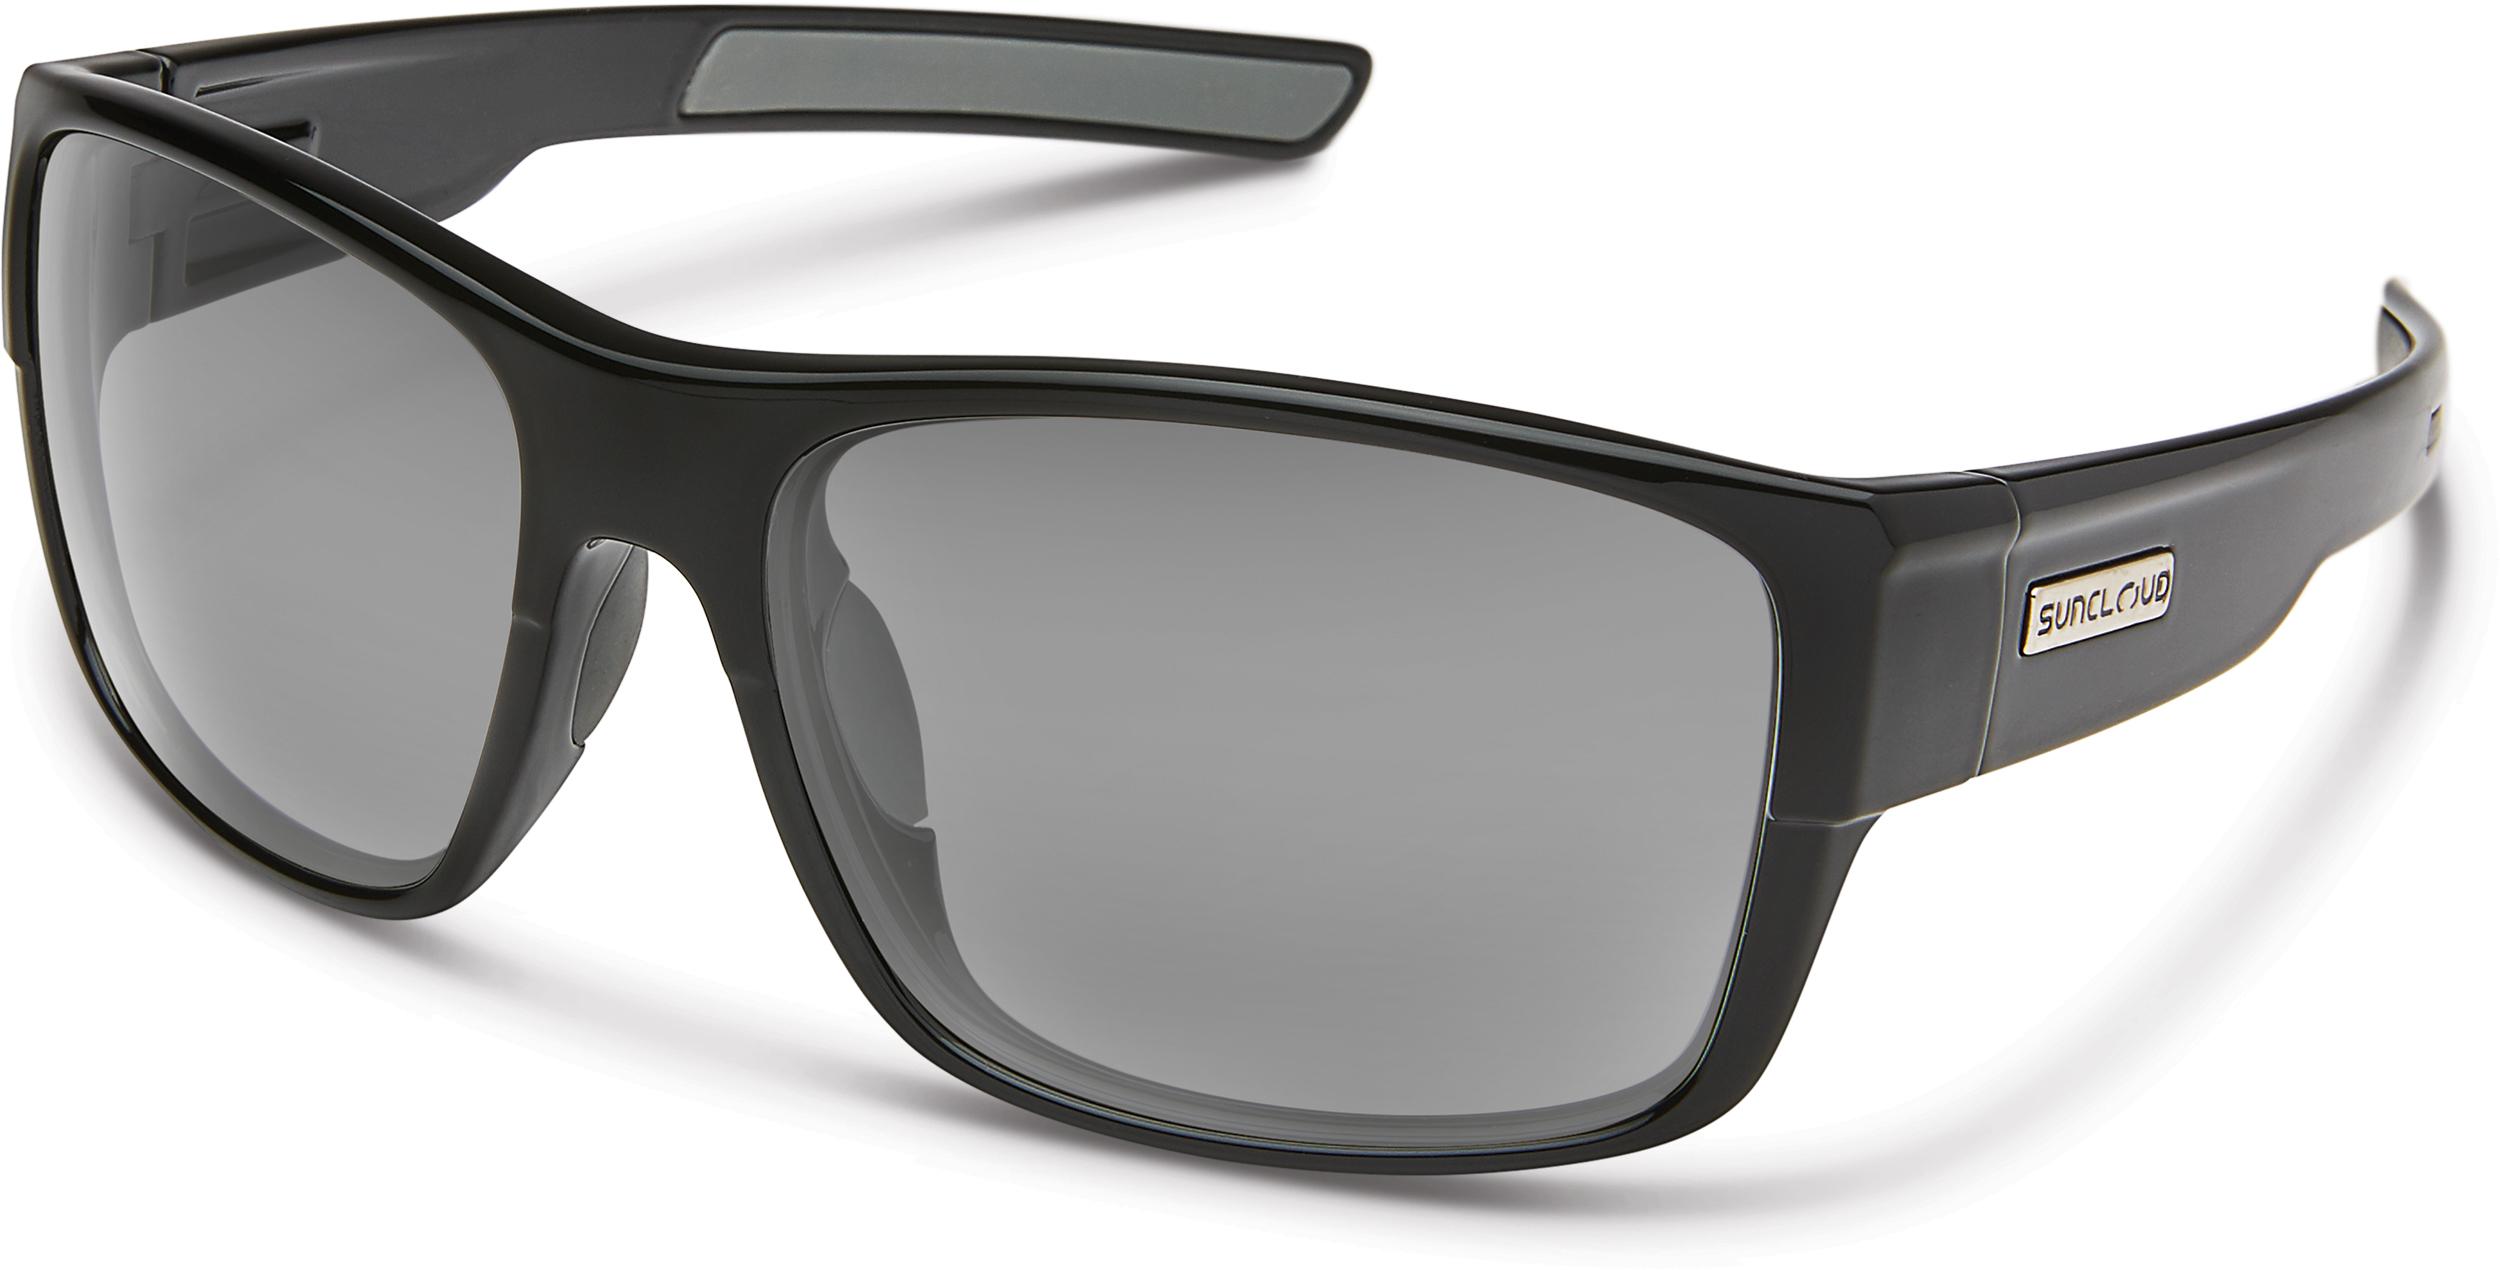 554a728c17 Suncloud Range Polarized Sunglasses - Unisex